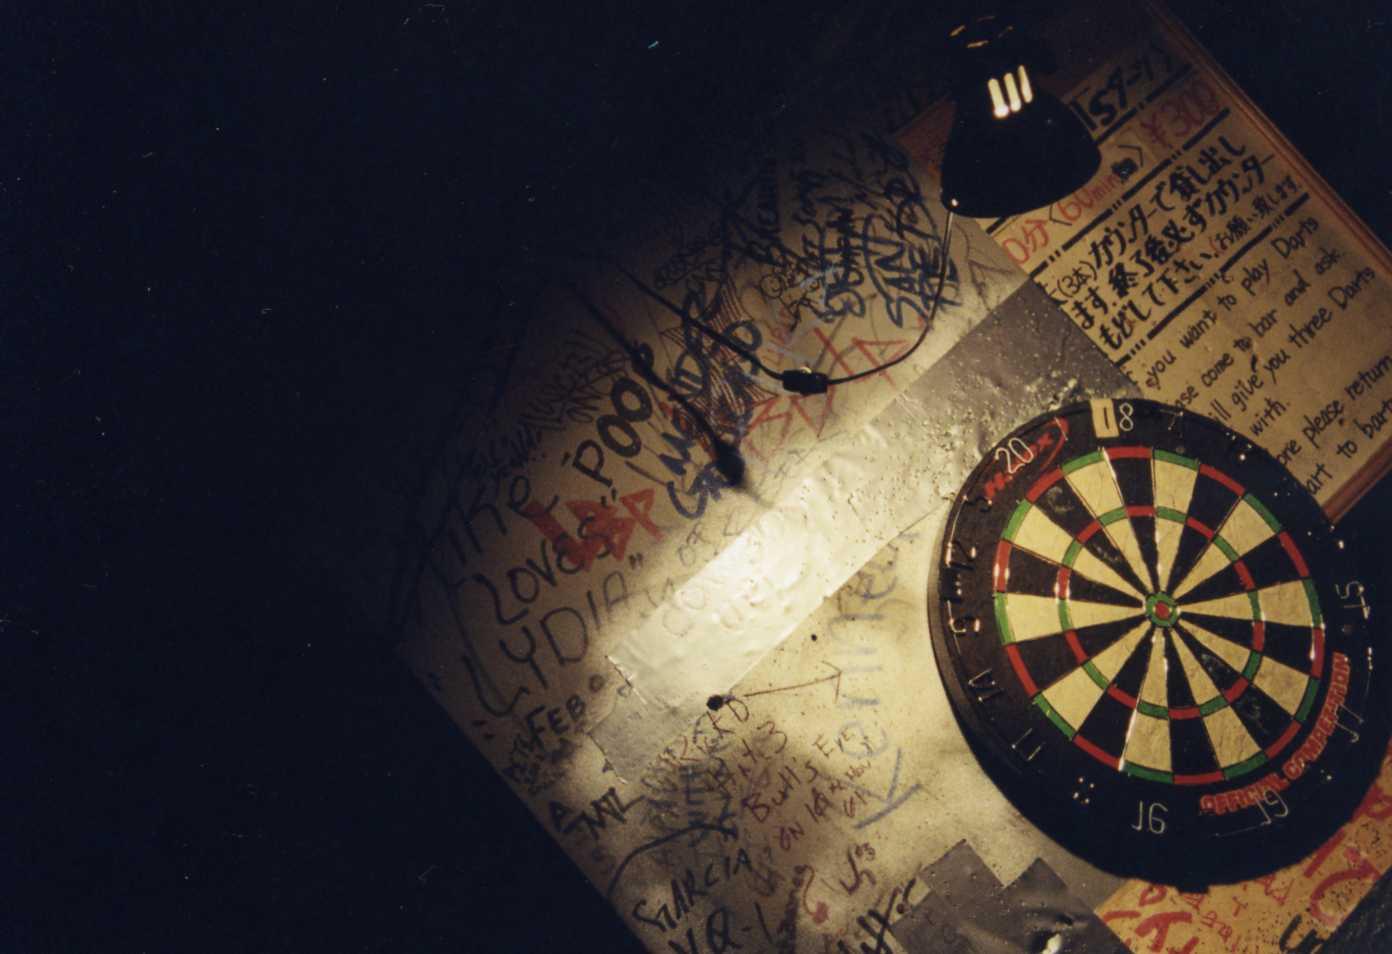 pds darts